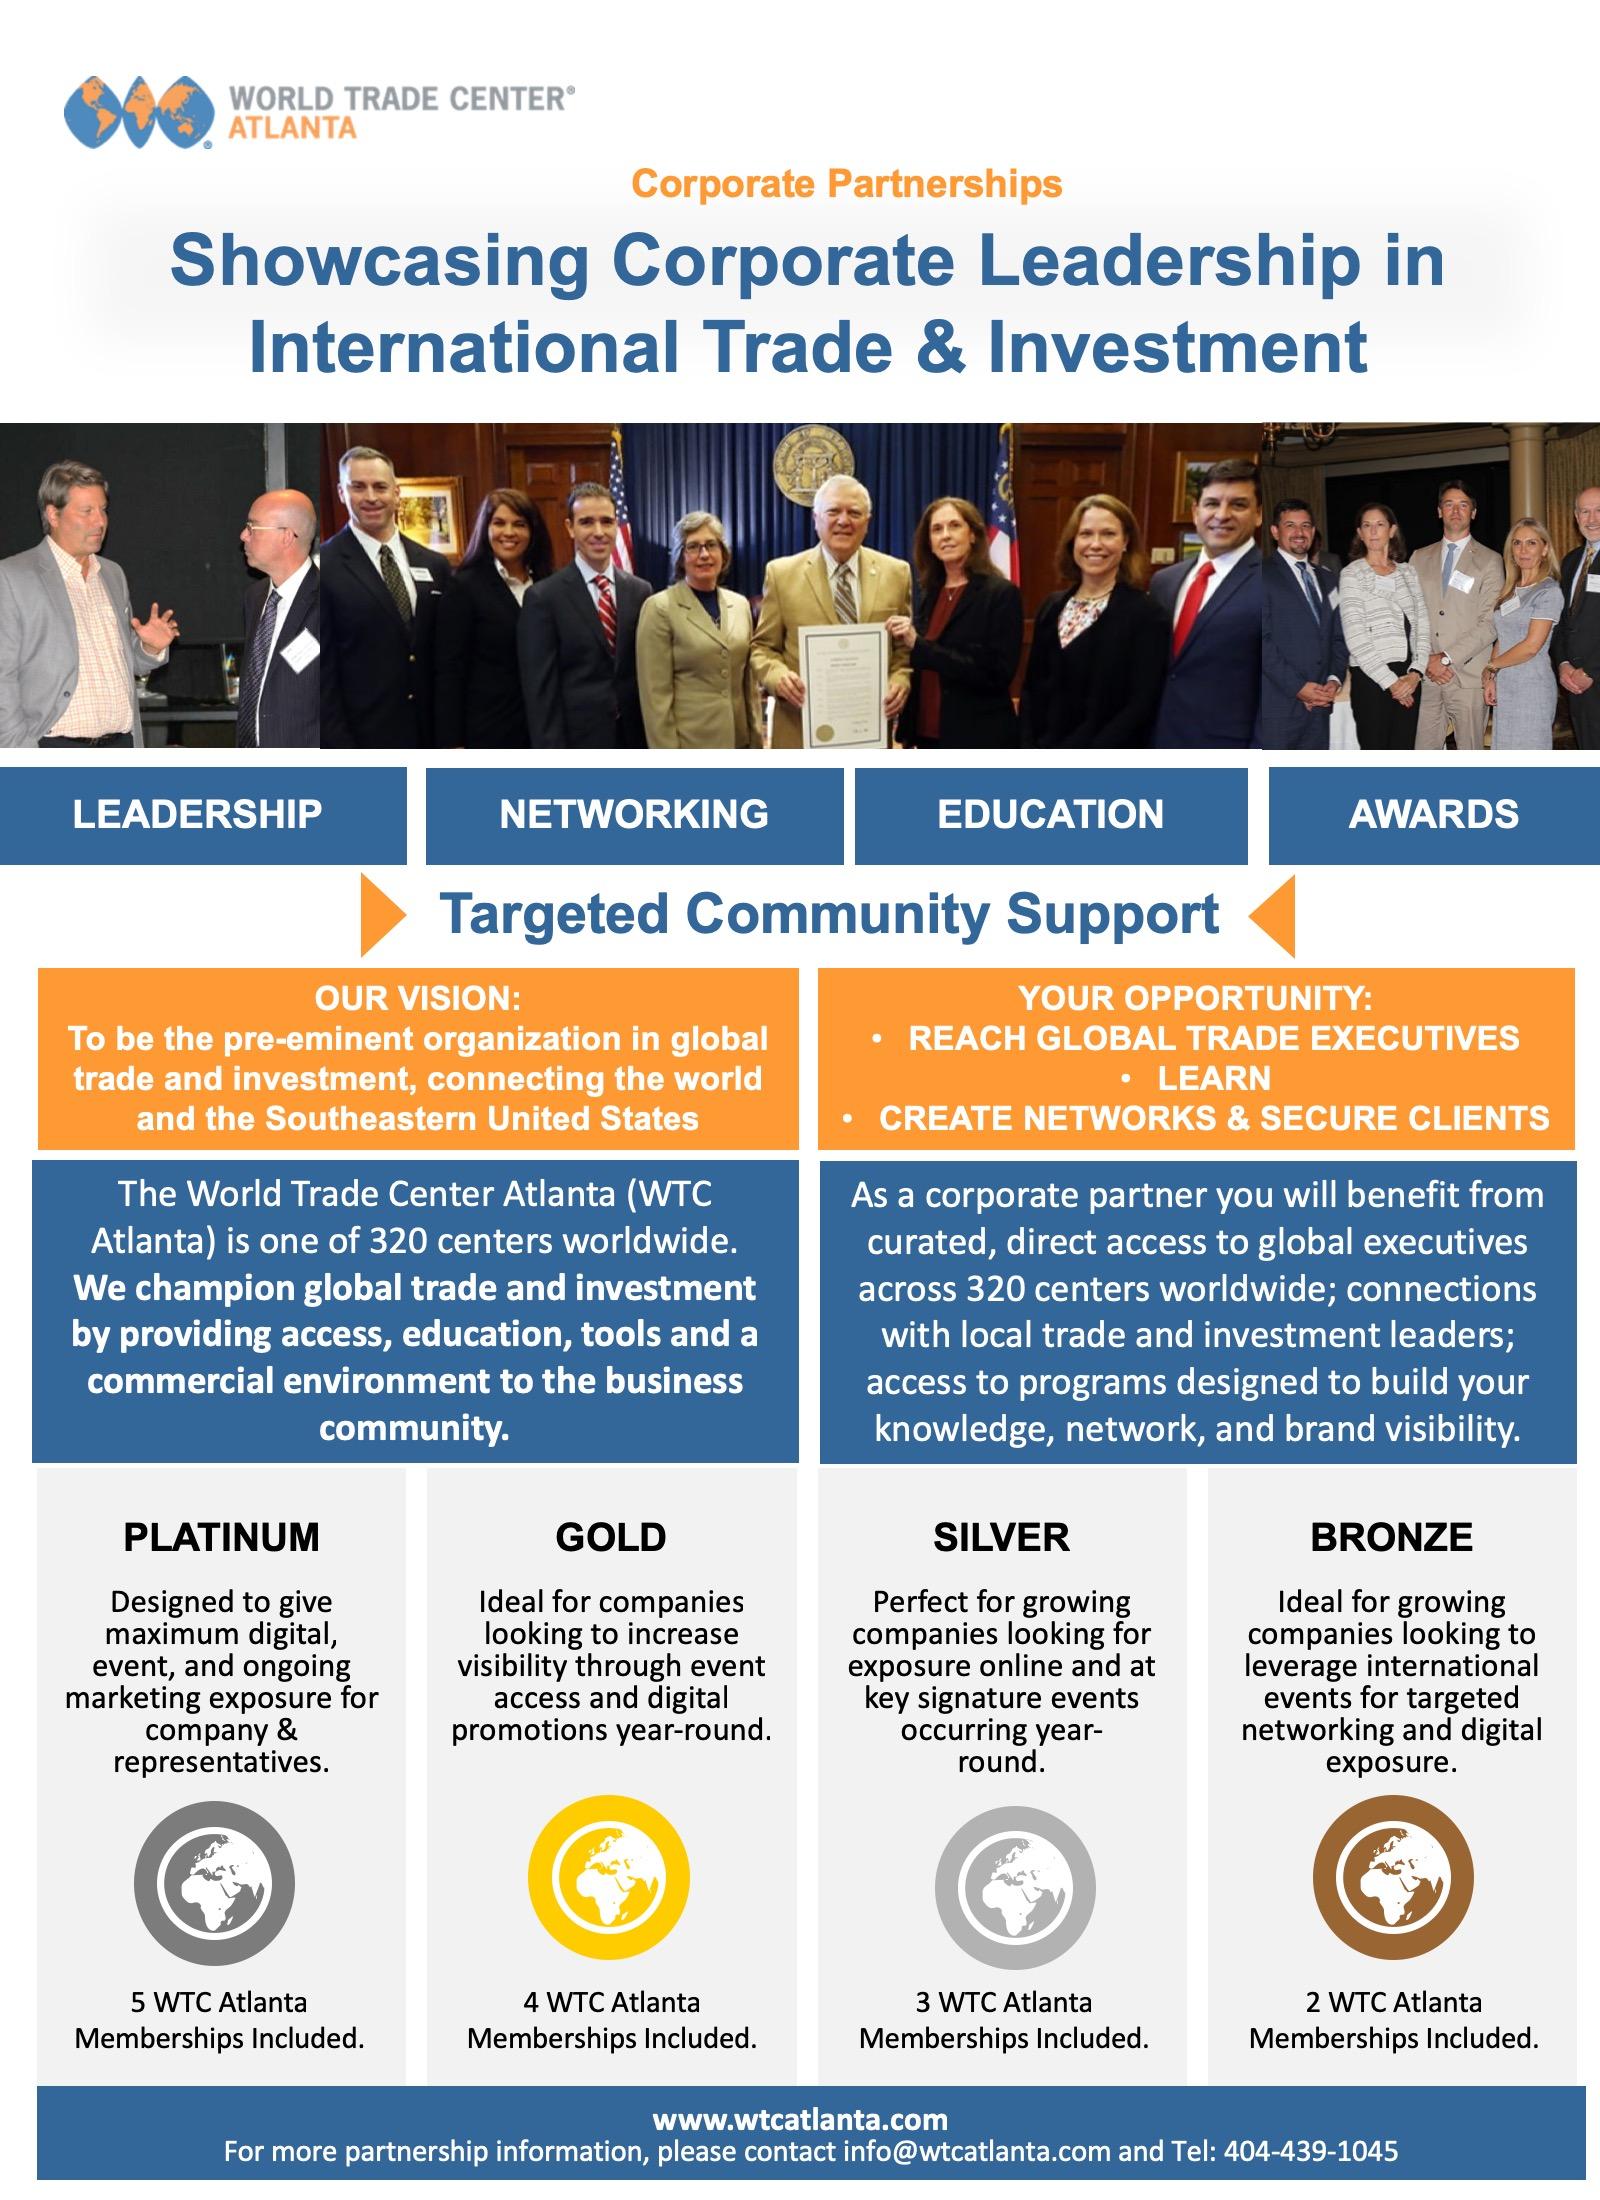 Corporate Partnership Wtca